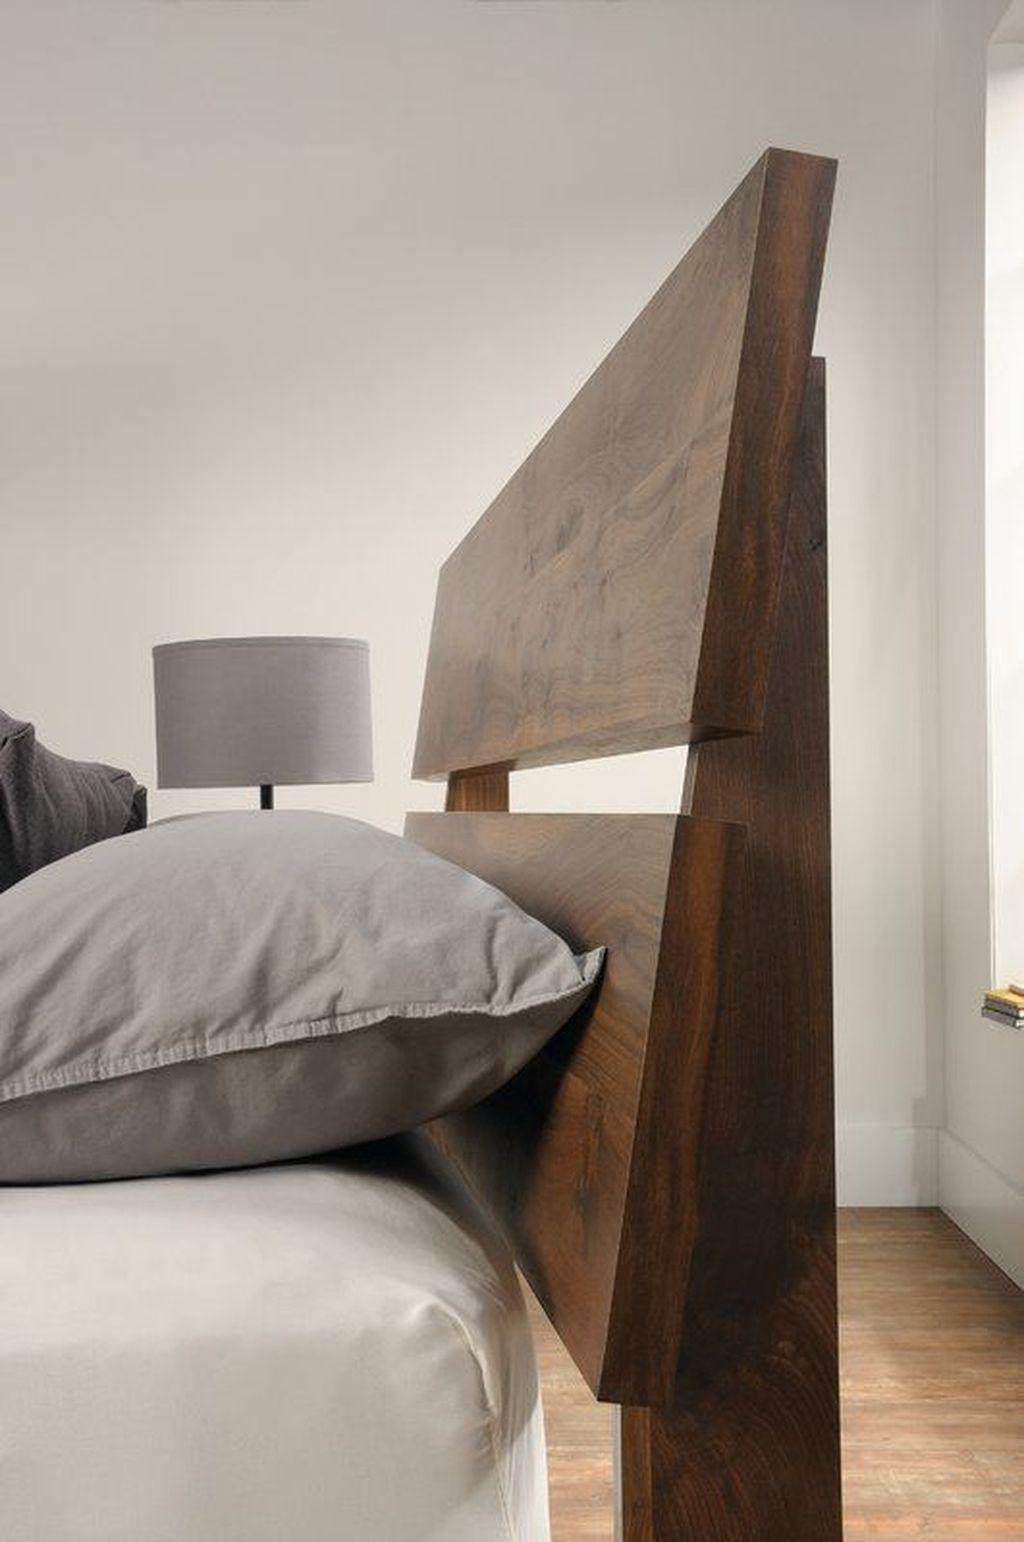 36 Stylish Diy Bedroom Headboard Design Ideas That Will Inspire You